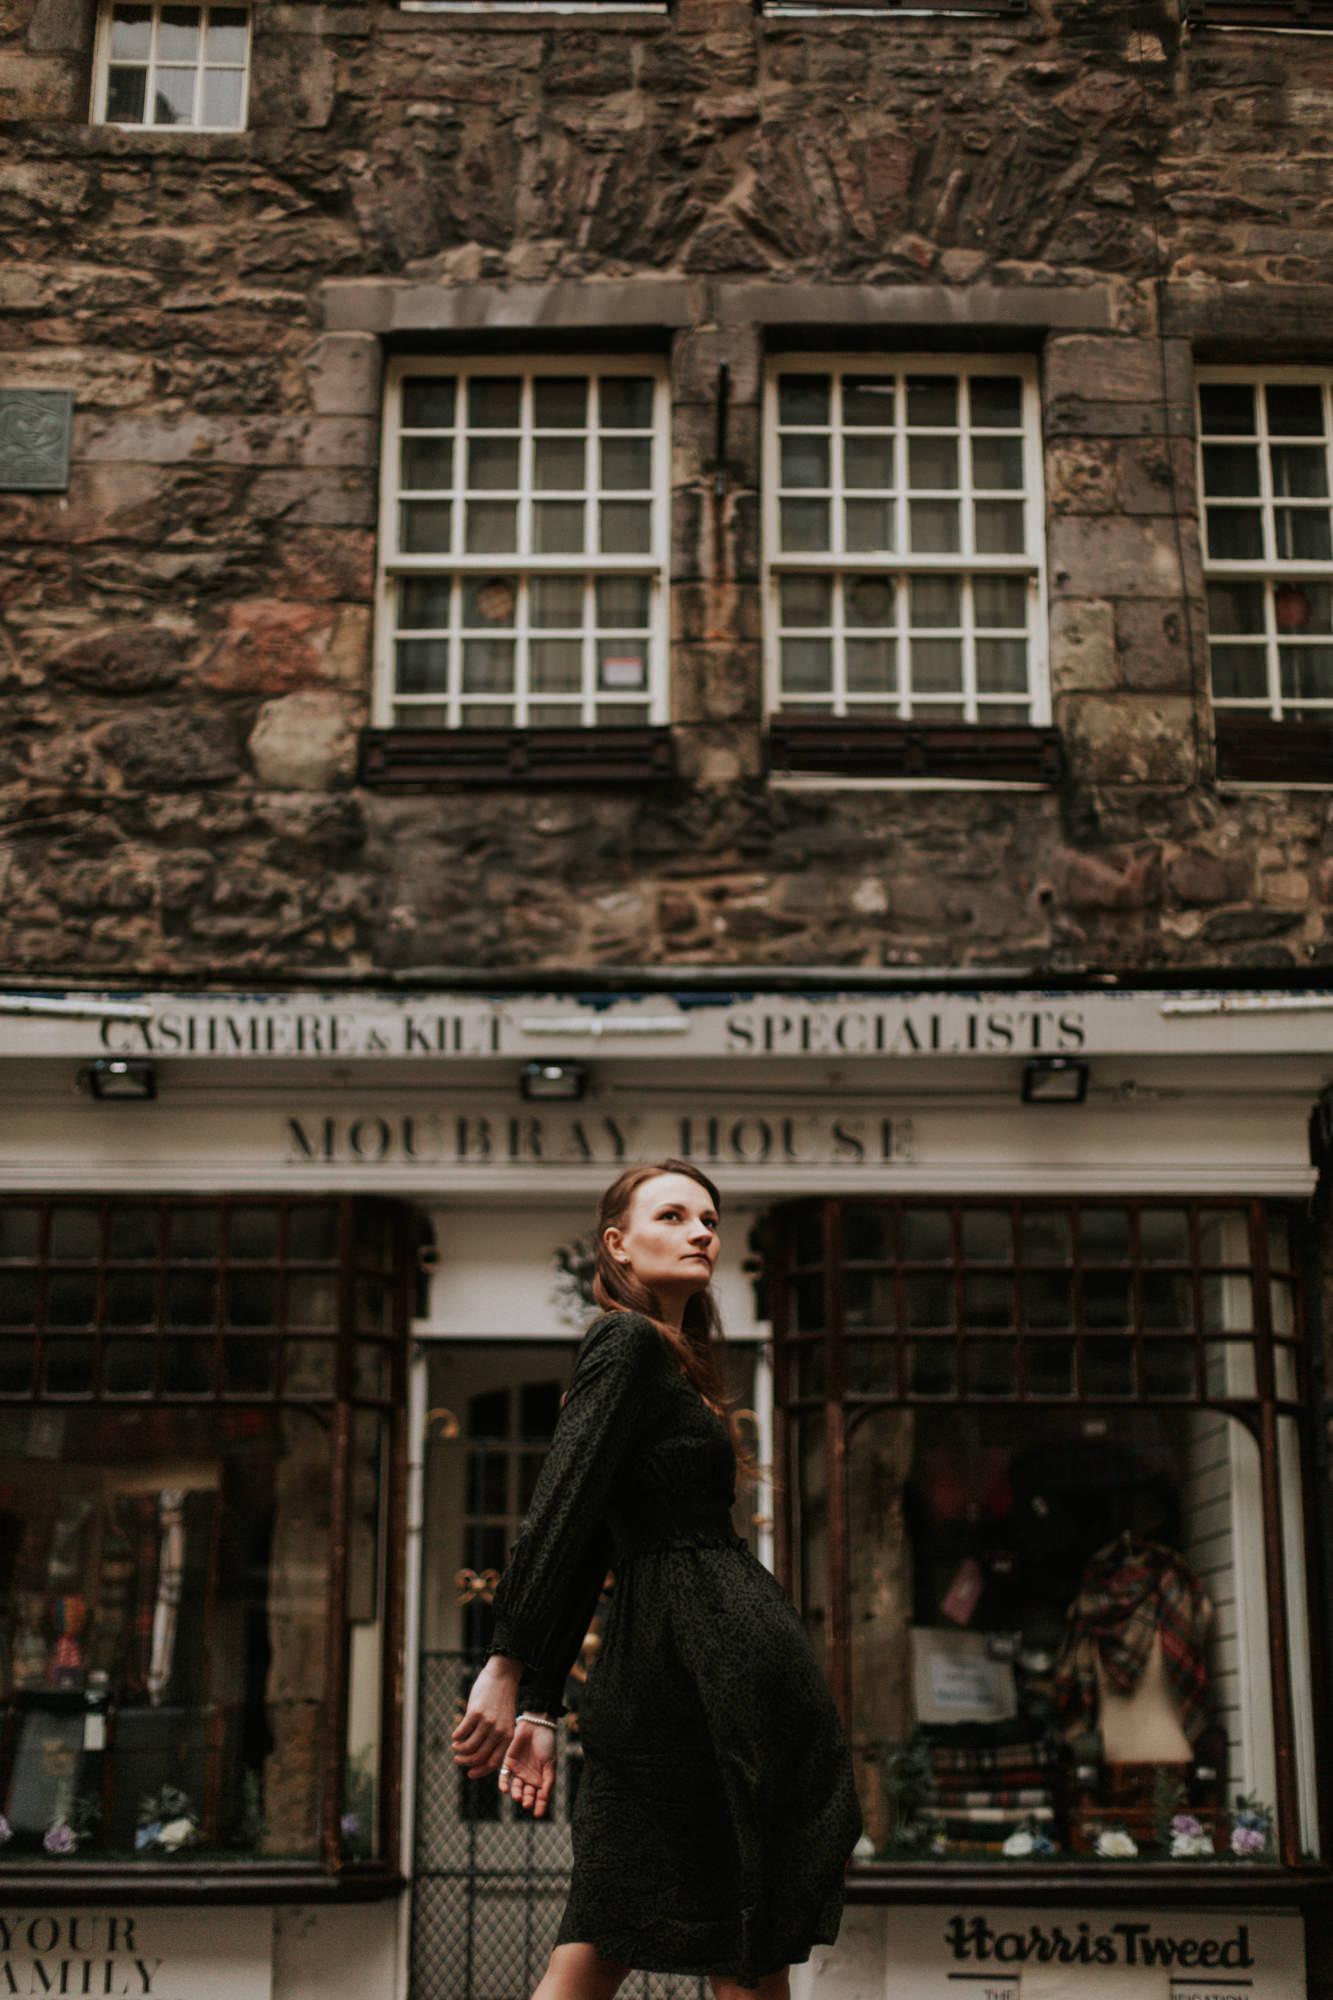 Scotland portrait photographer, Scotland Model, UK Fashion model, wedding photographer scotland, photographer edinburgh scotland